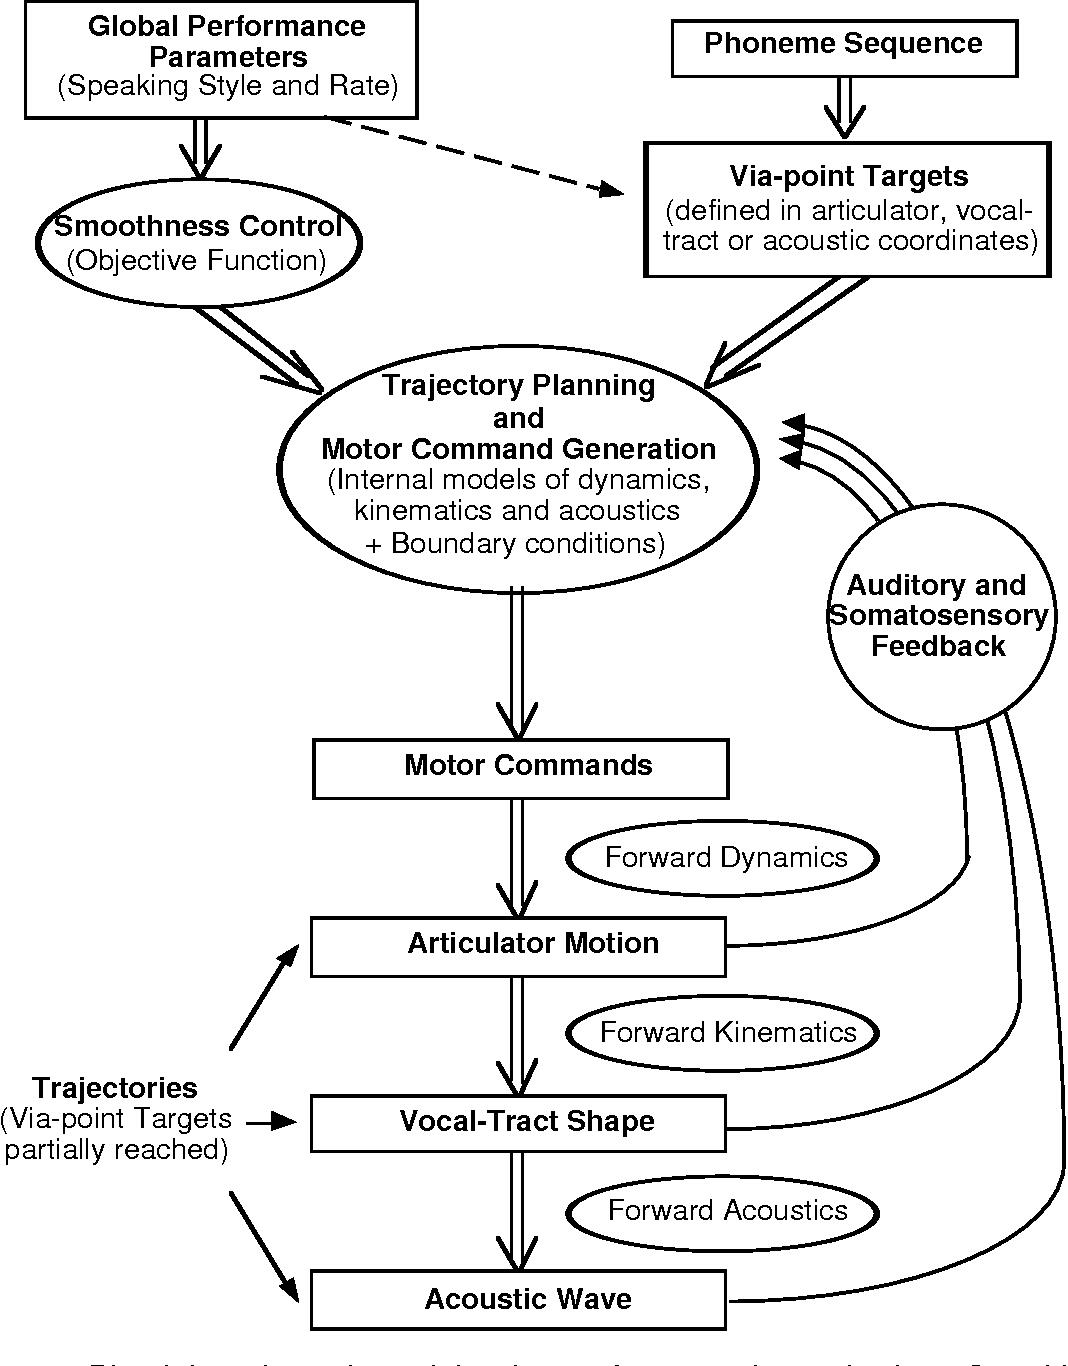 the dynamics of audiovisual behavior in speech semantic scholar Oral Cavity and Pharynx